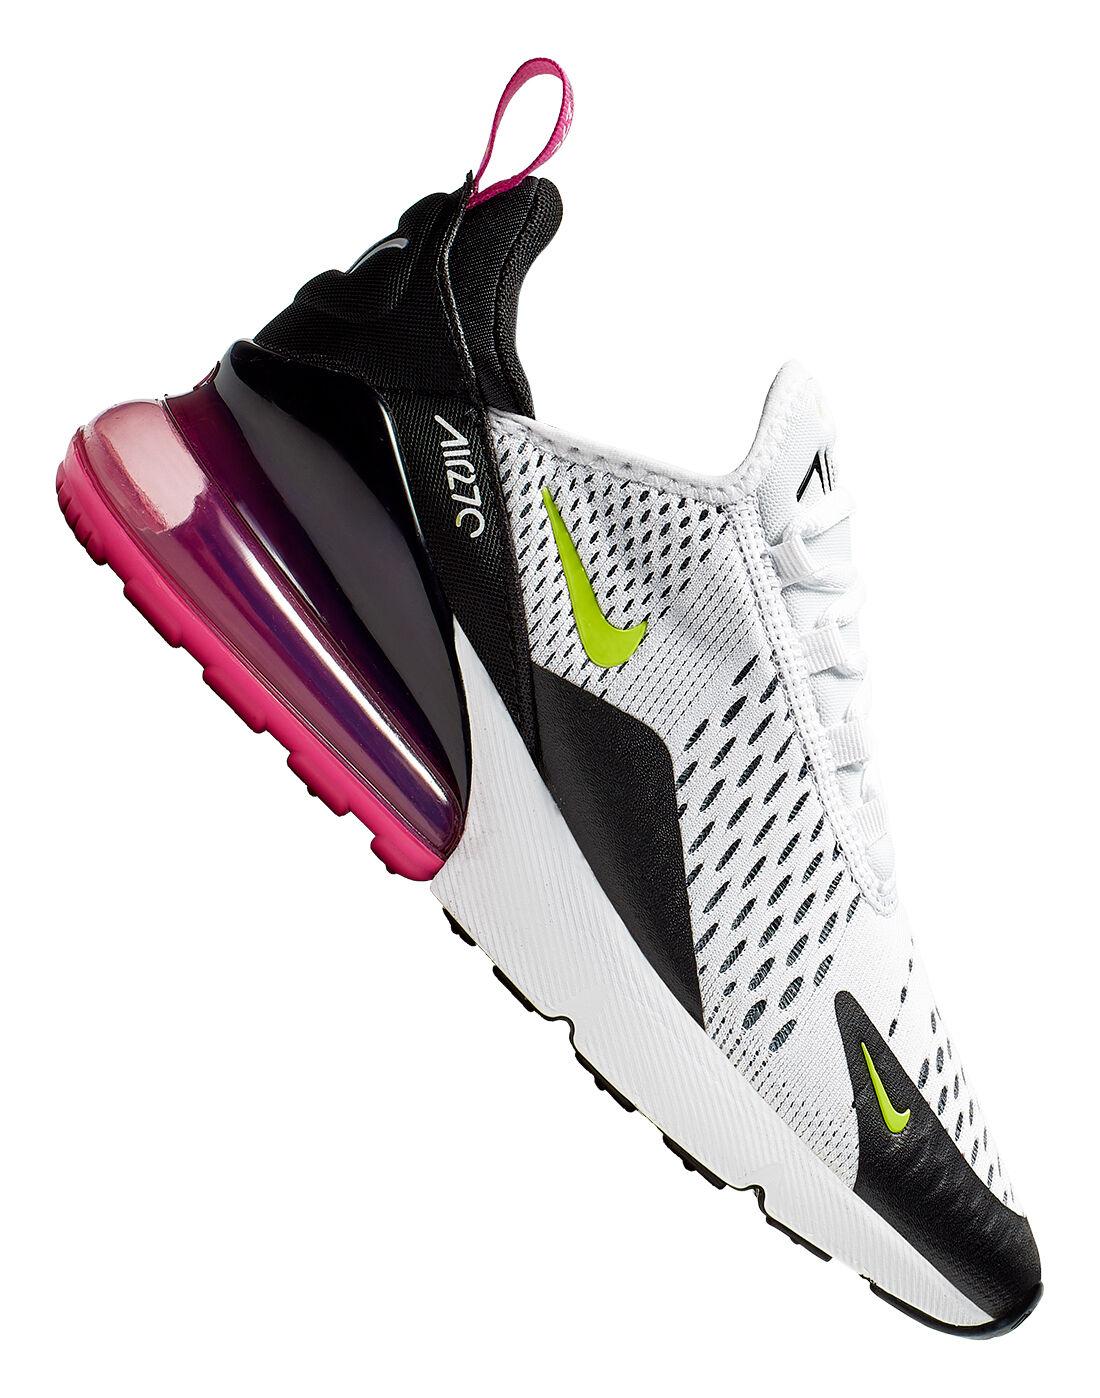 Black \u0026 Red Nike Air Max 270